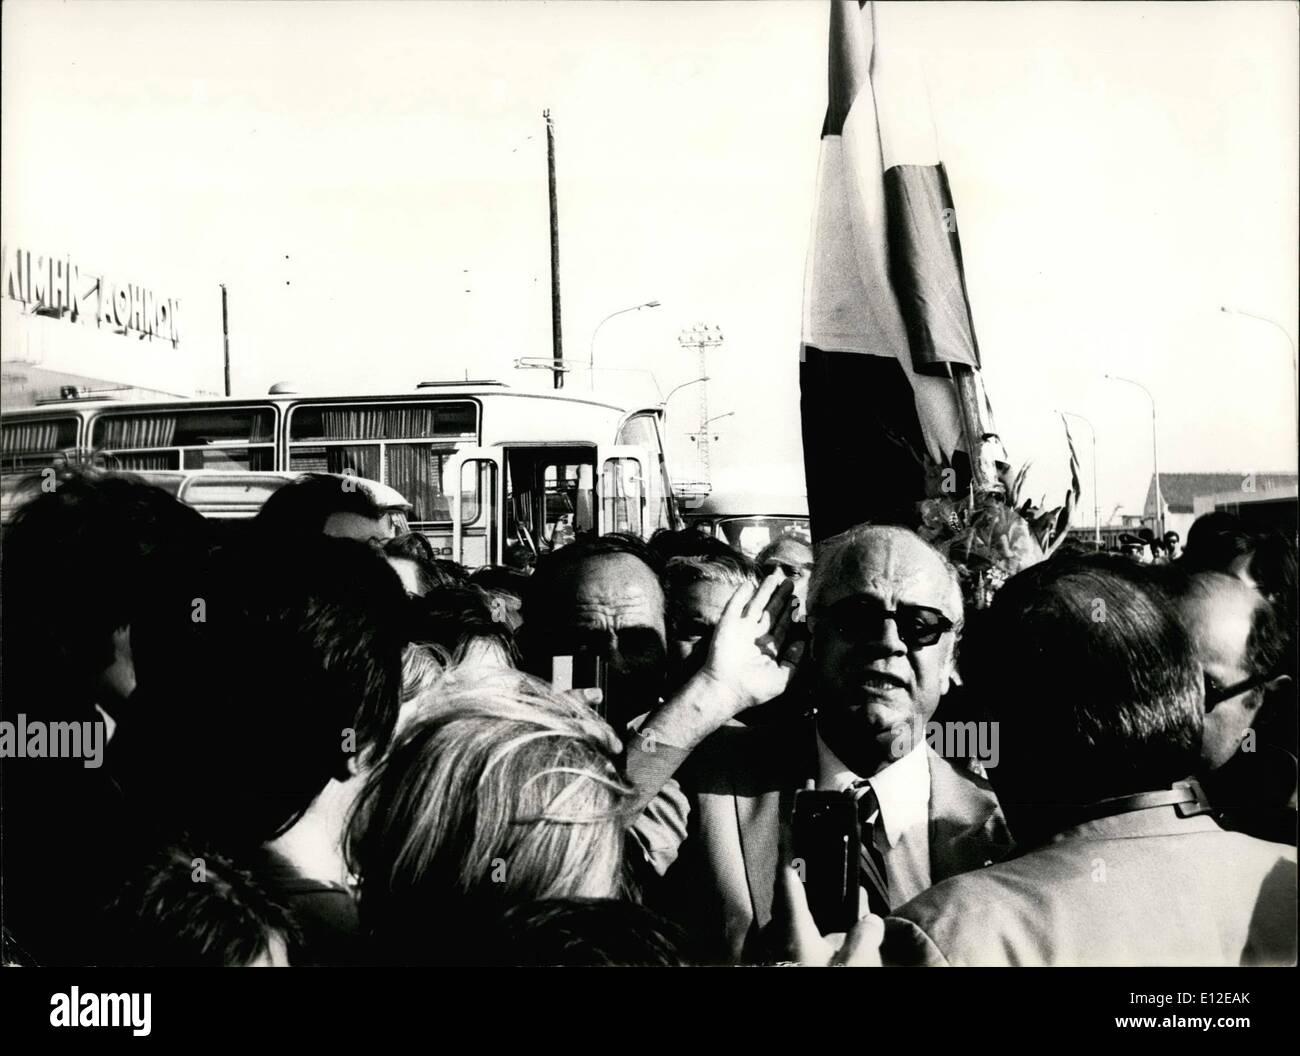 Dec. 16, 2011 - Former Greek Cabinet Minister and prominent exile leader, John Zighdis returning home. OPS: John - Stock Image